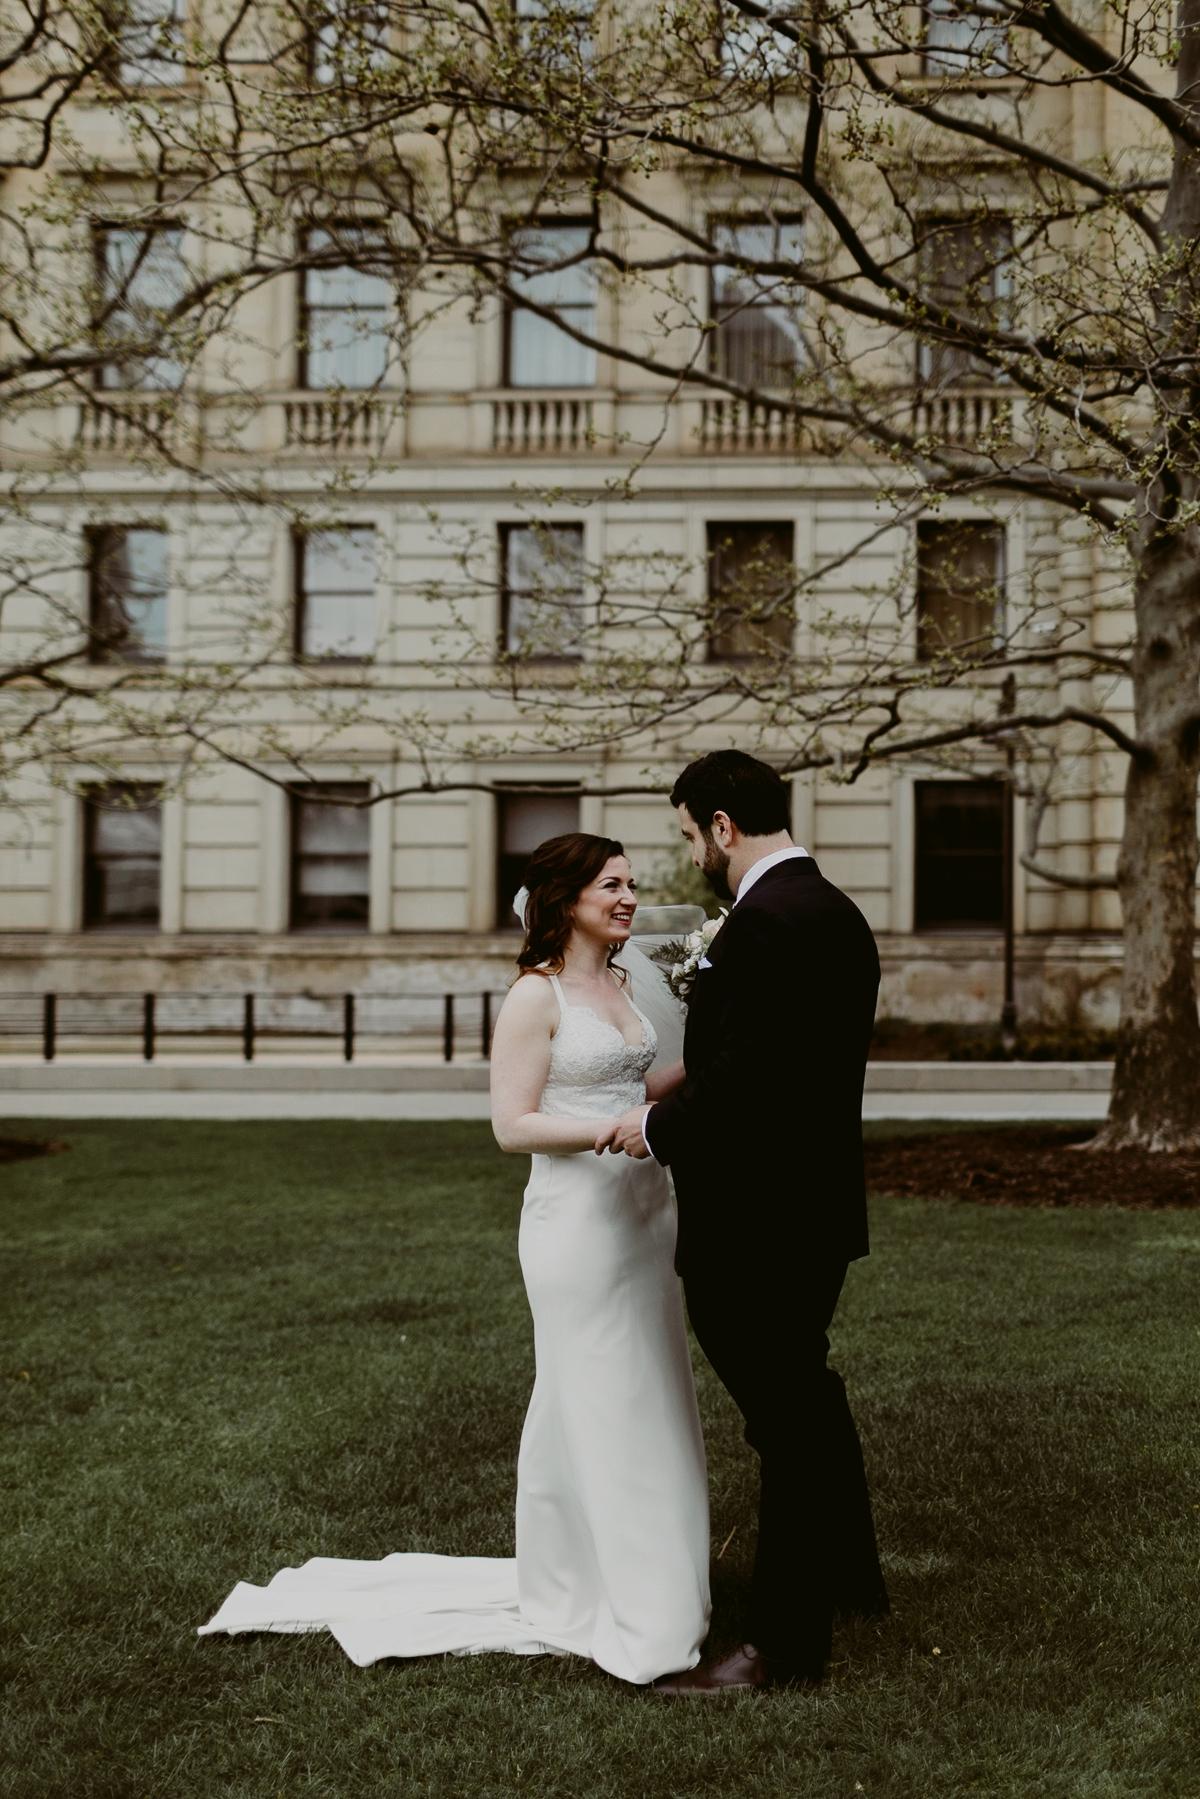 Rachel+Michael_Lake-Erie-Building-Cleveland-Wedding_M+J-Photographers-76.jpg